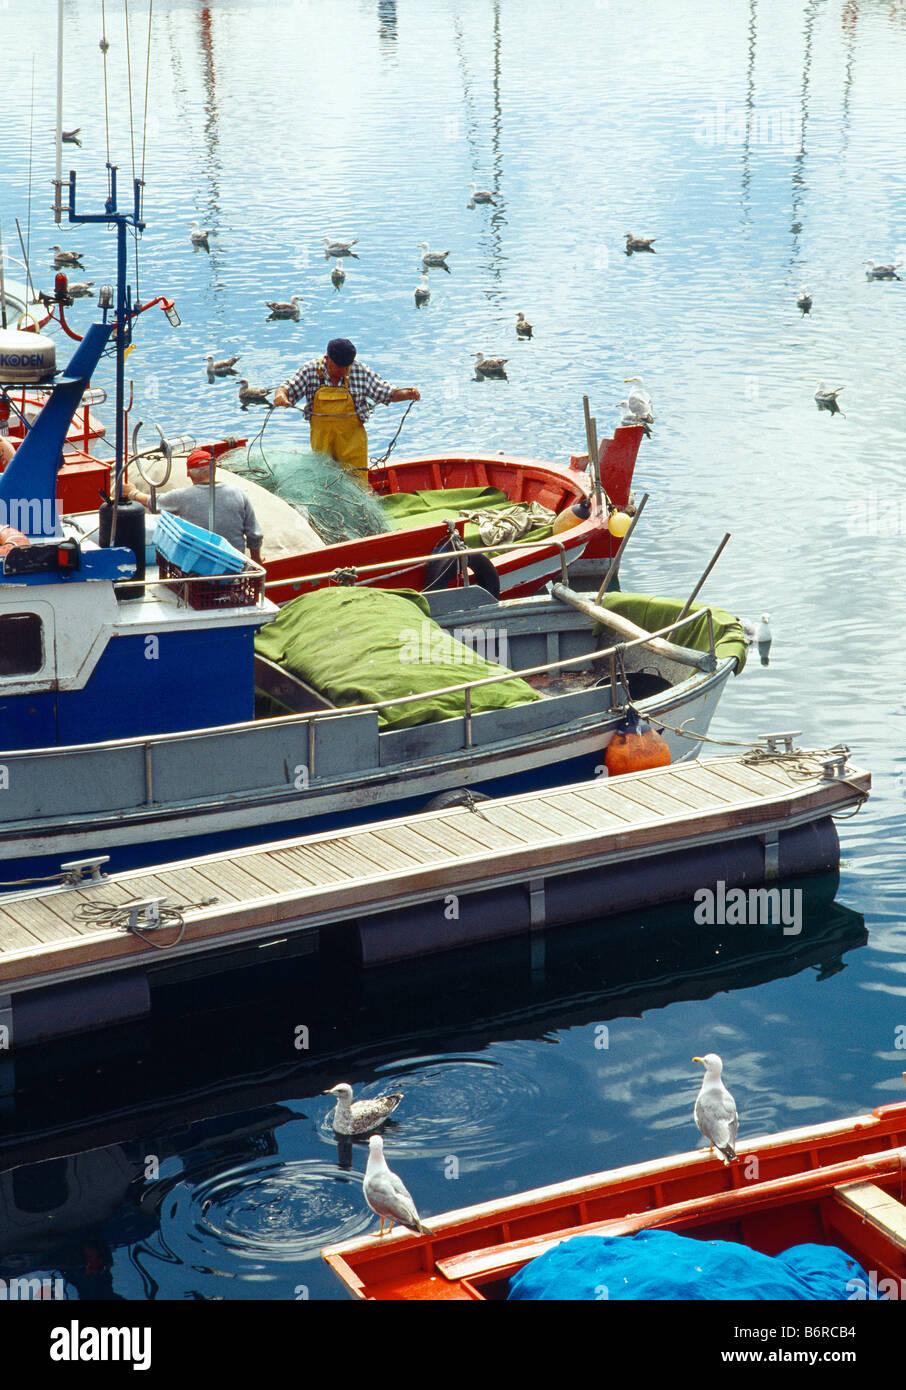 Fishermen on boat at dock. La Coruña. Galicia. Spain. - Stock Image